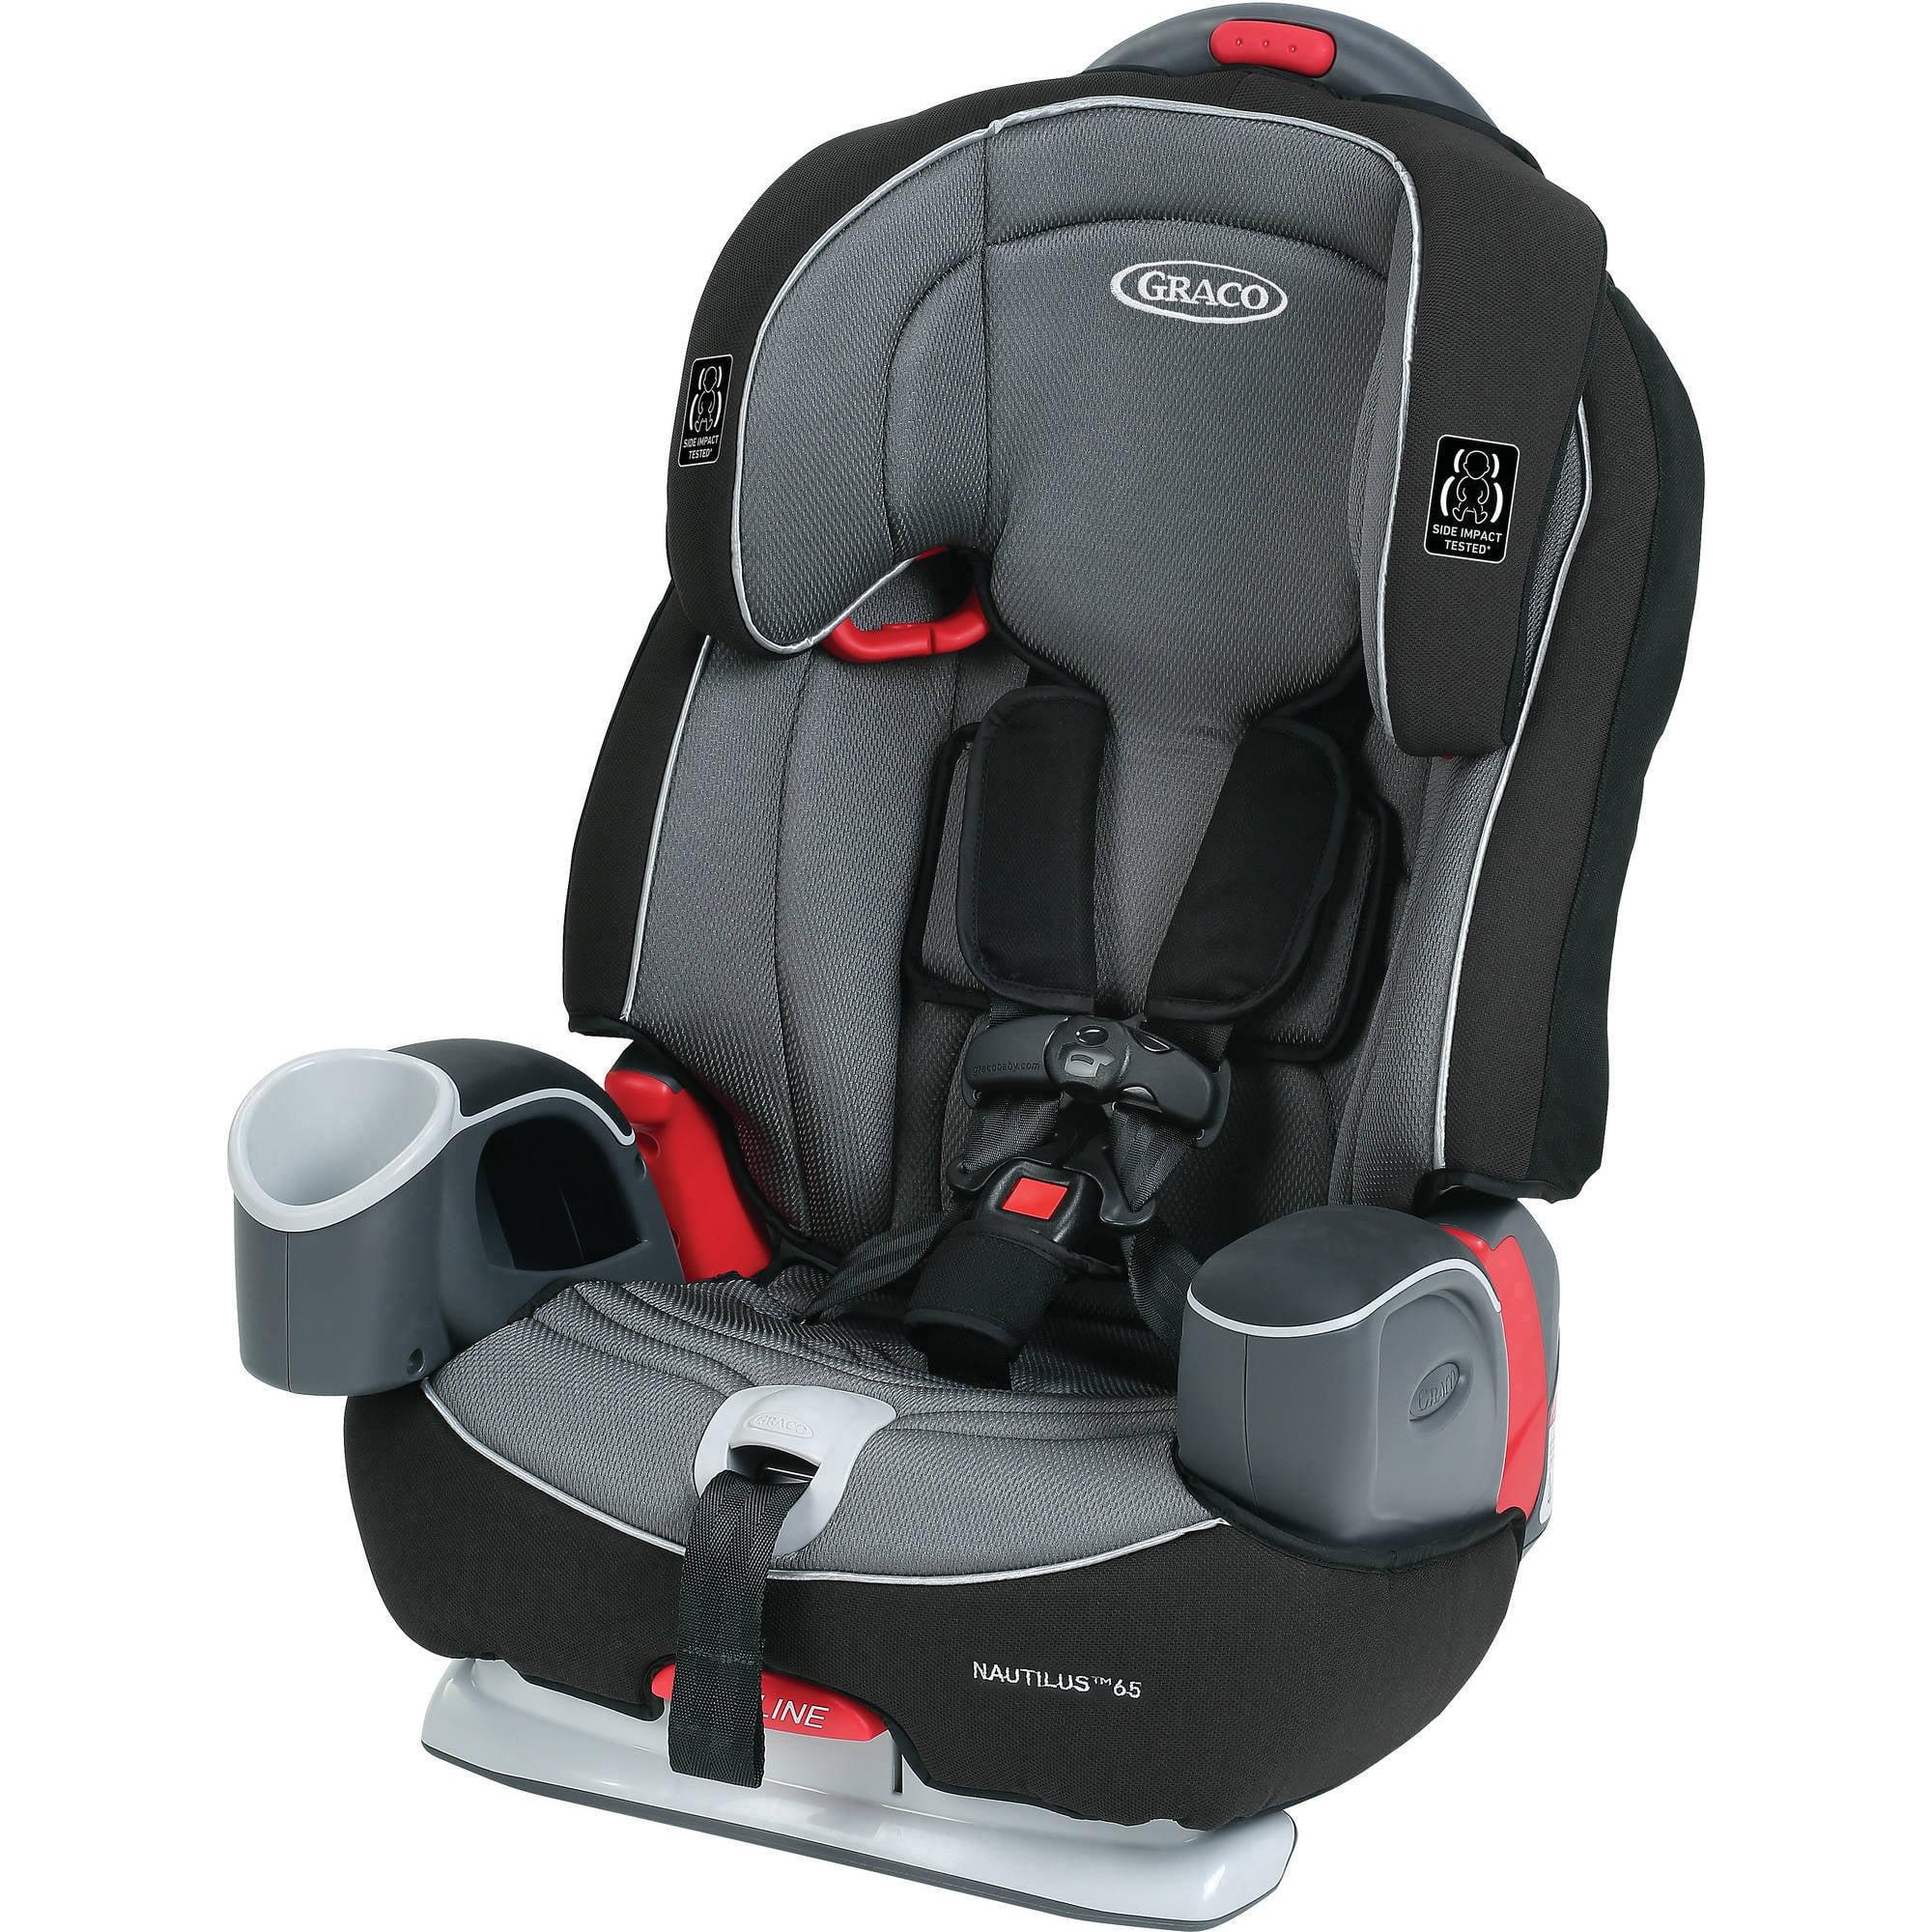 Graco Nautilus 65 3-in-1 Harness Booster Car Seat, Bravo